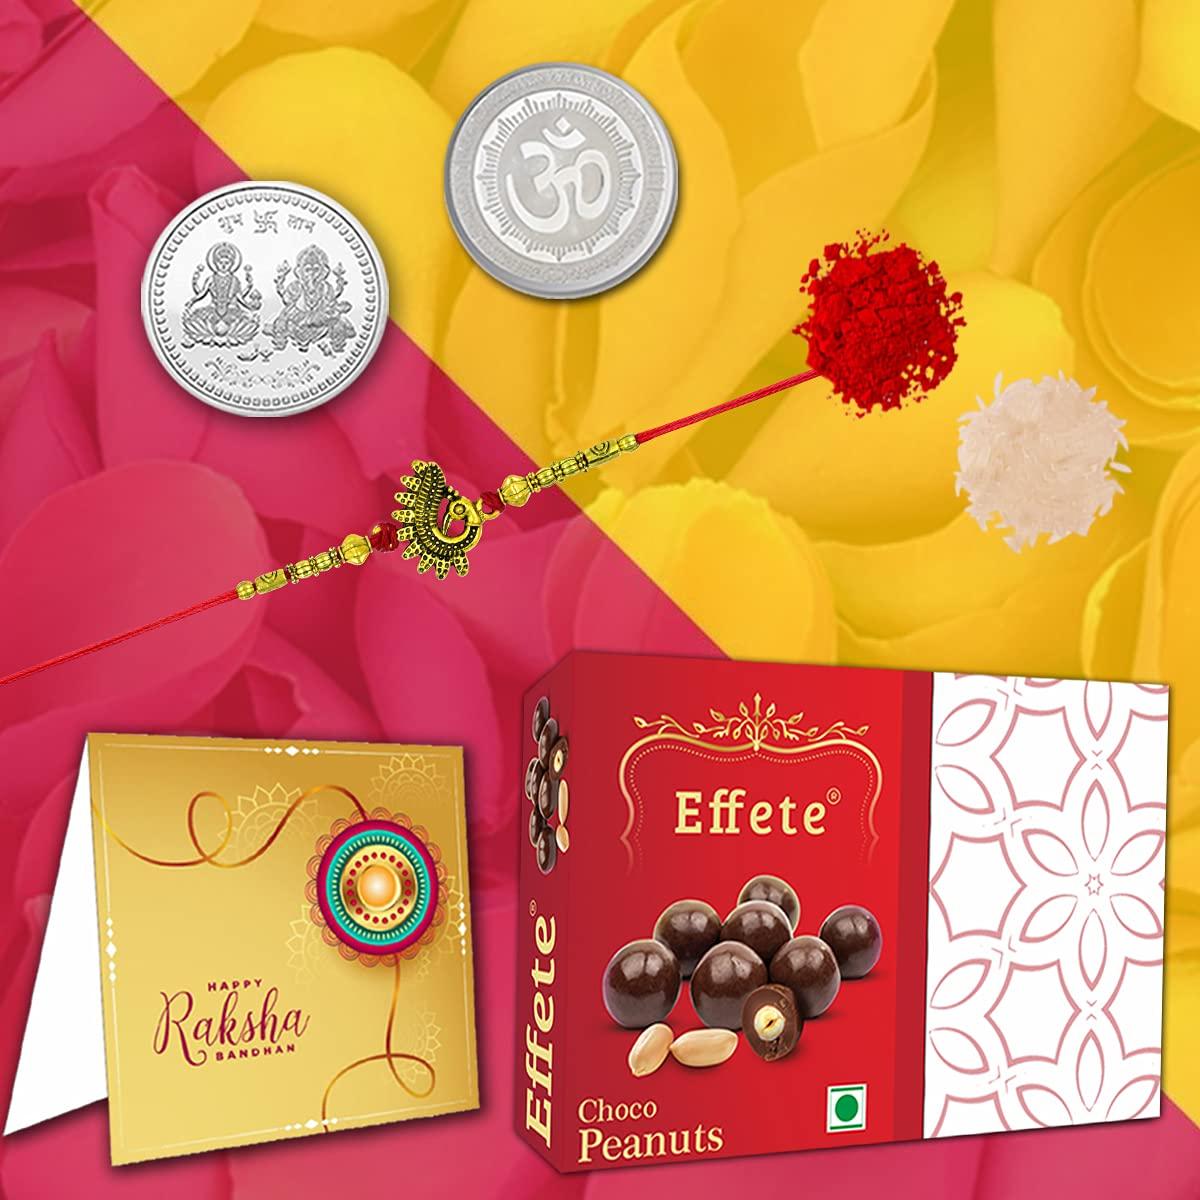 Rakhi/Bracelet with Chocolate Peanuts 32gm, Roli & Chawal, Greeting Card and Laxmi Ganesh Silver Pooja Coin